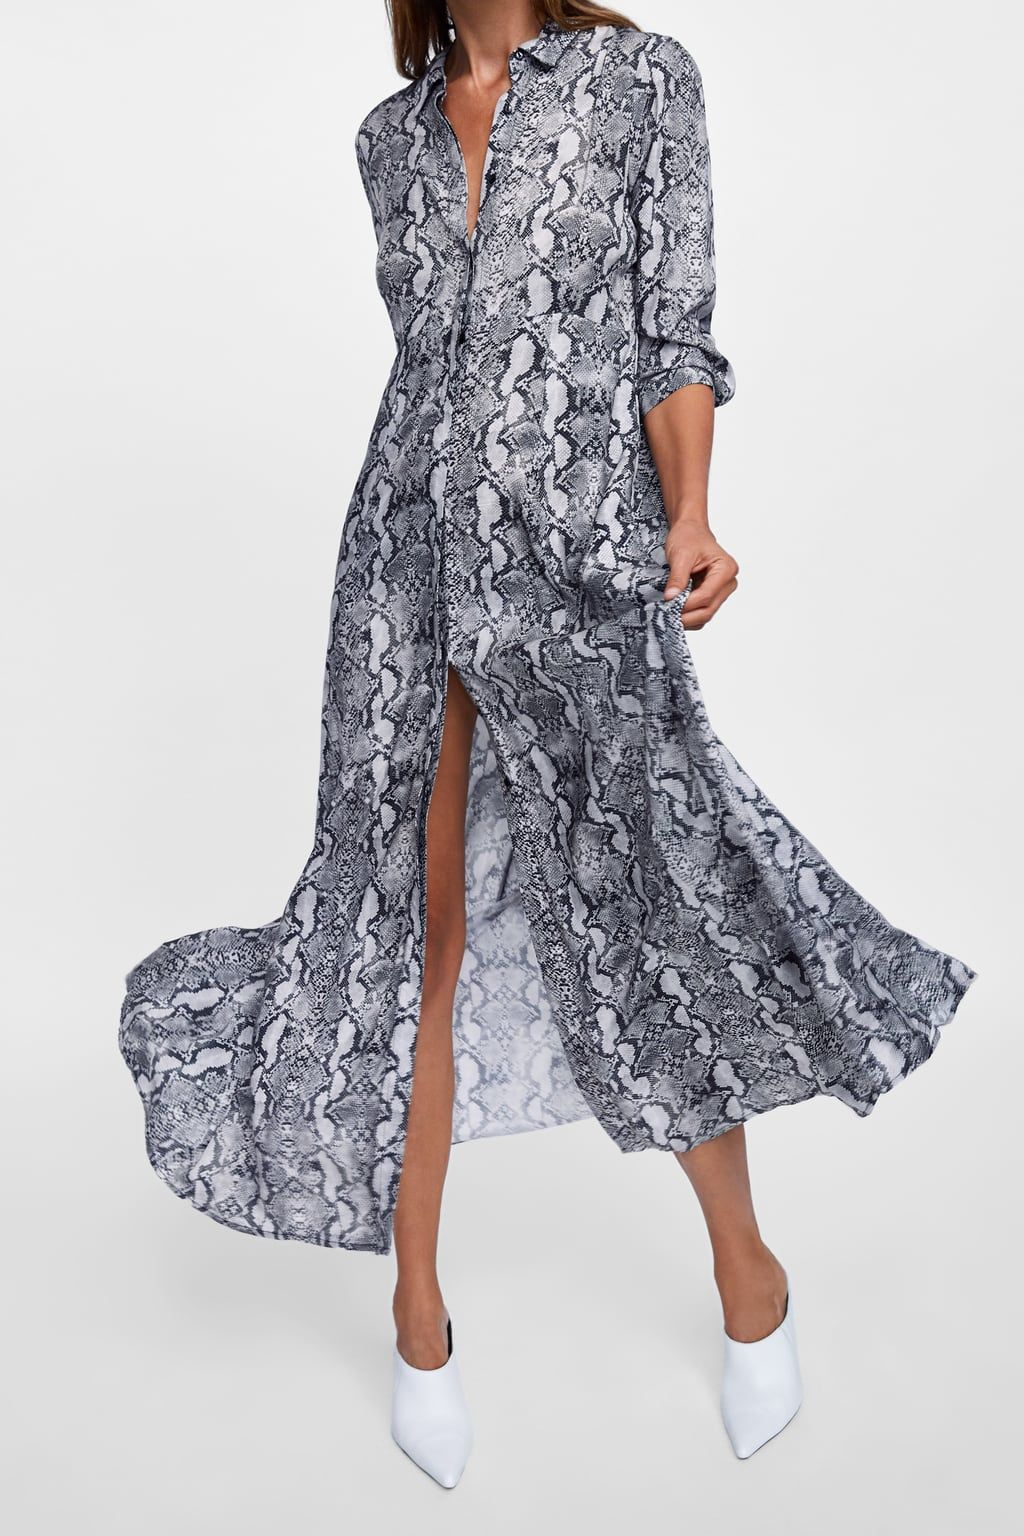 34506f37c430 Image 2 of SNAKESKIN PRINTED SHIRT DRESS from Zara | Women's fashion ...